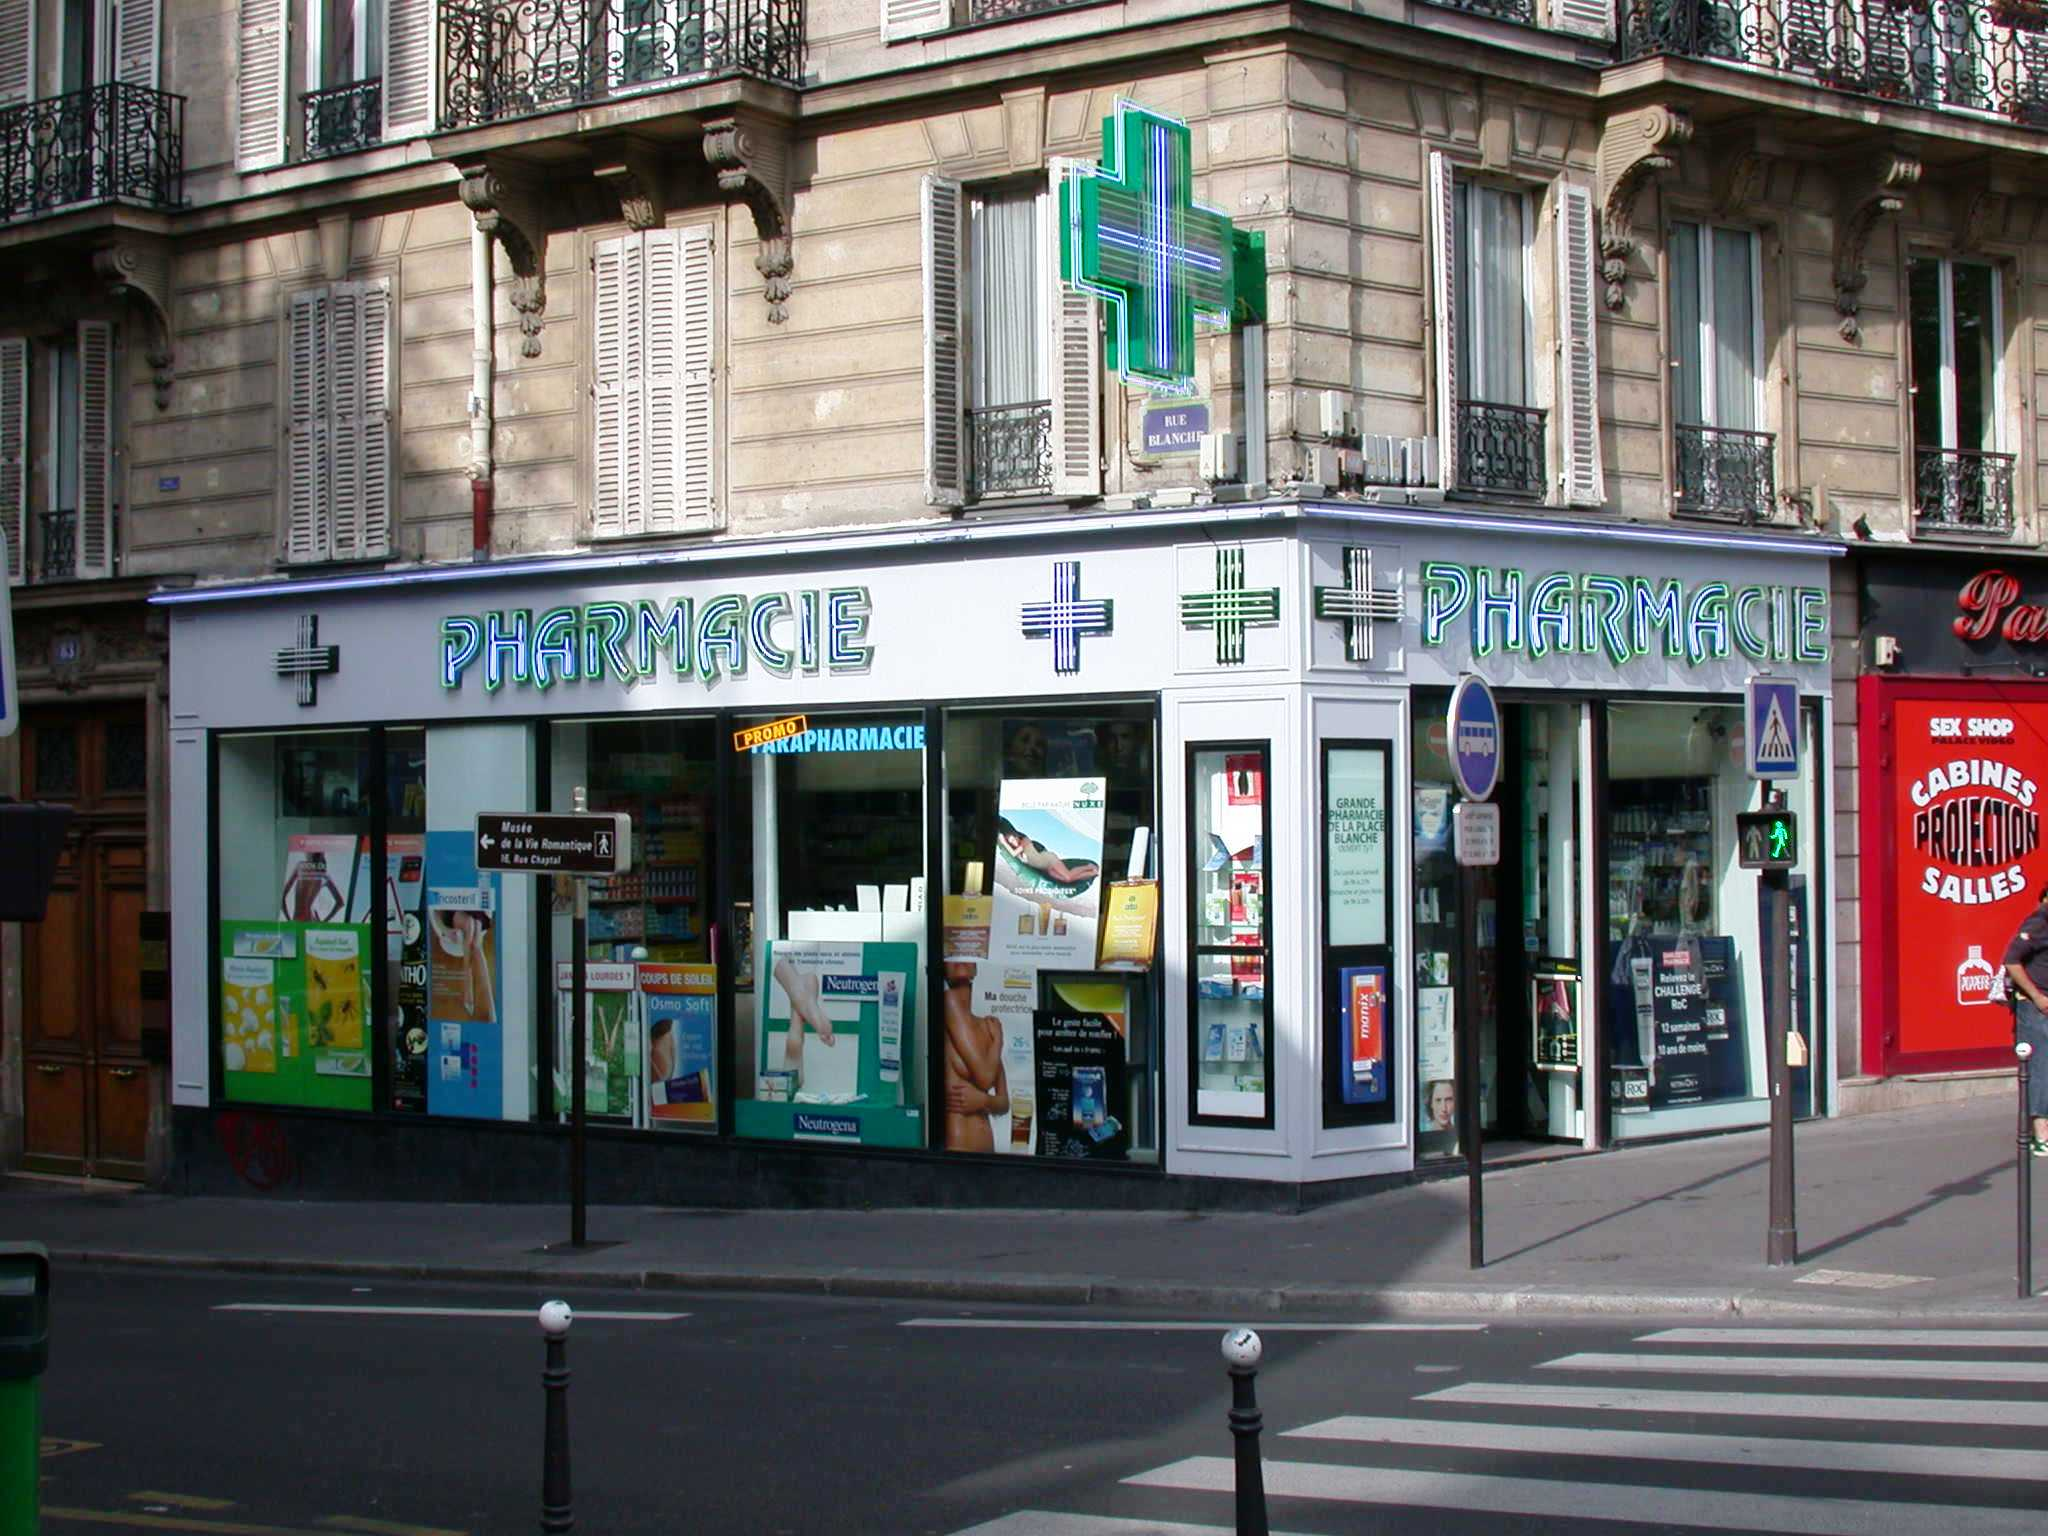 acheter du clindamycin pas cher en france